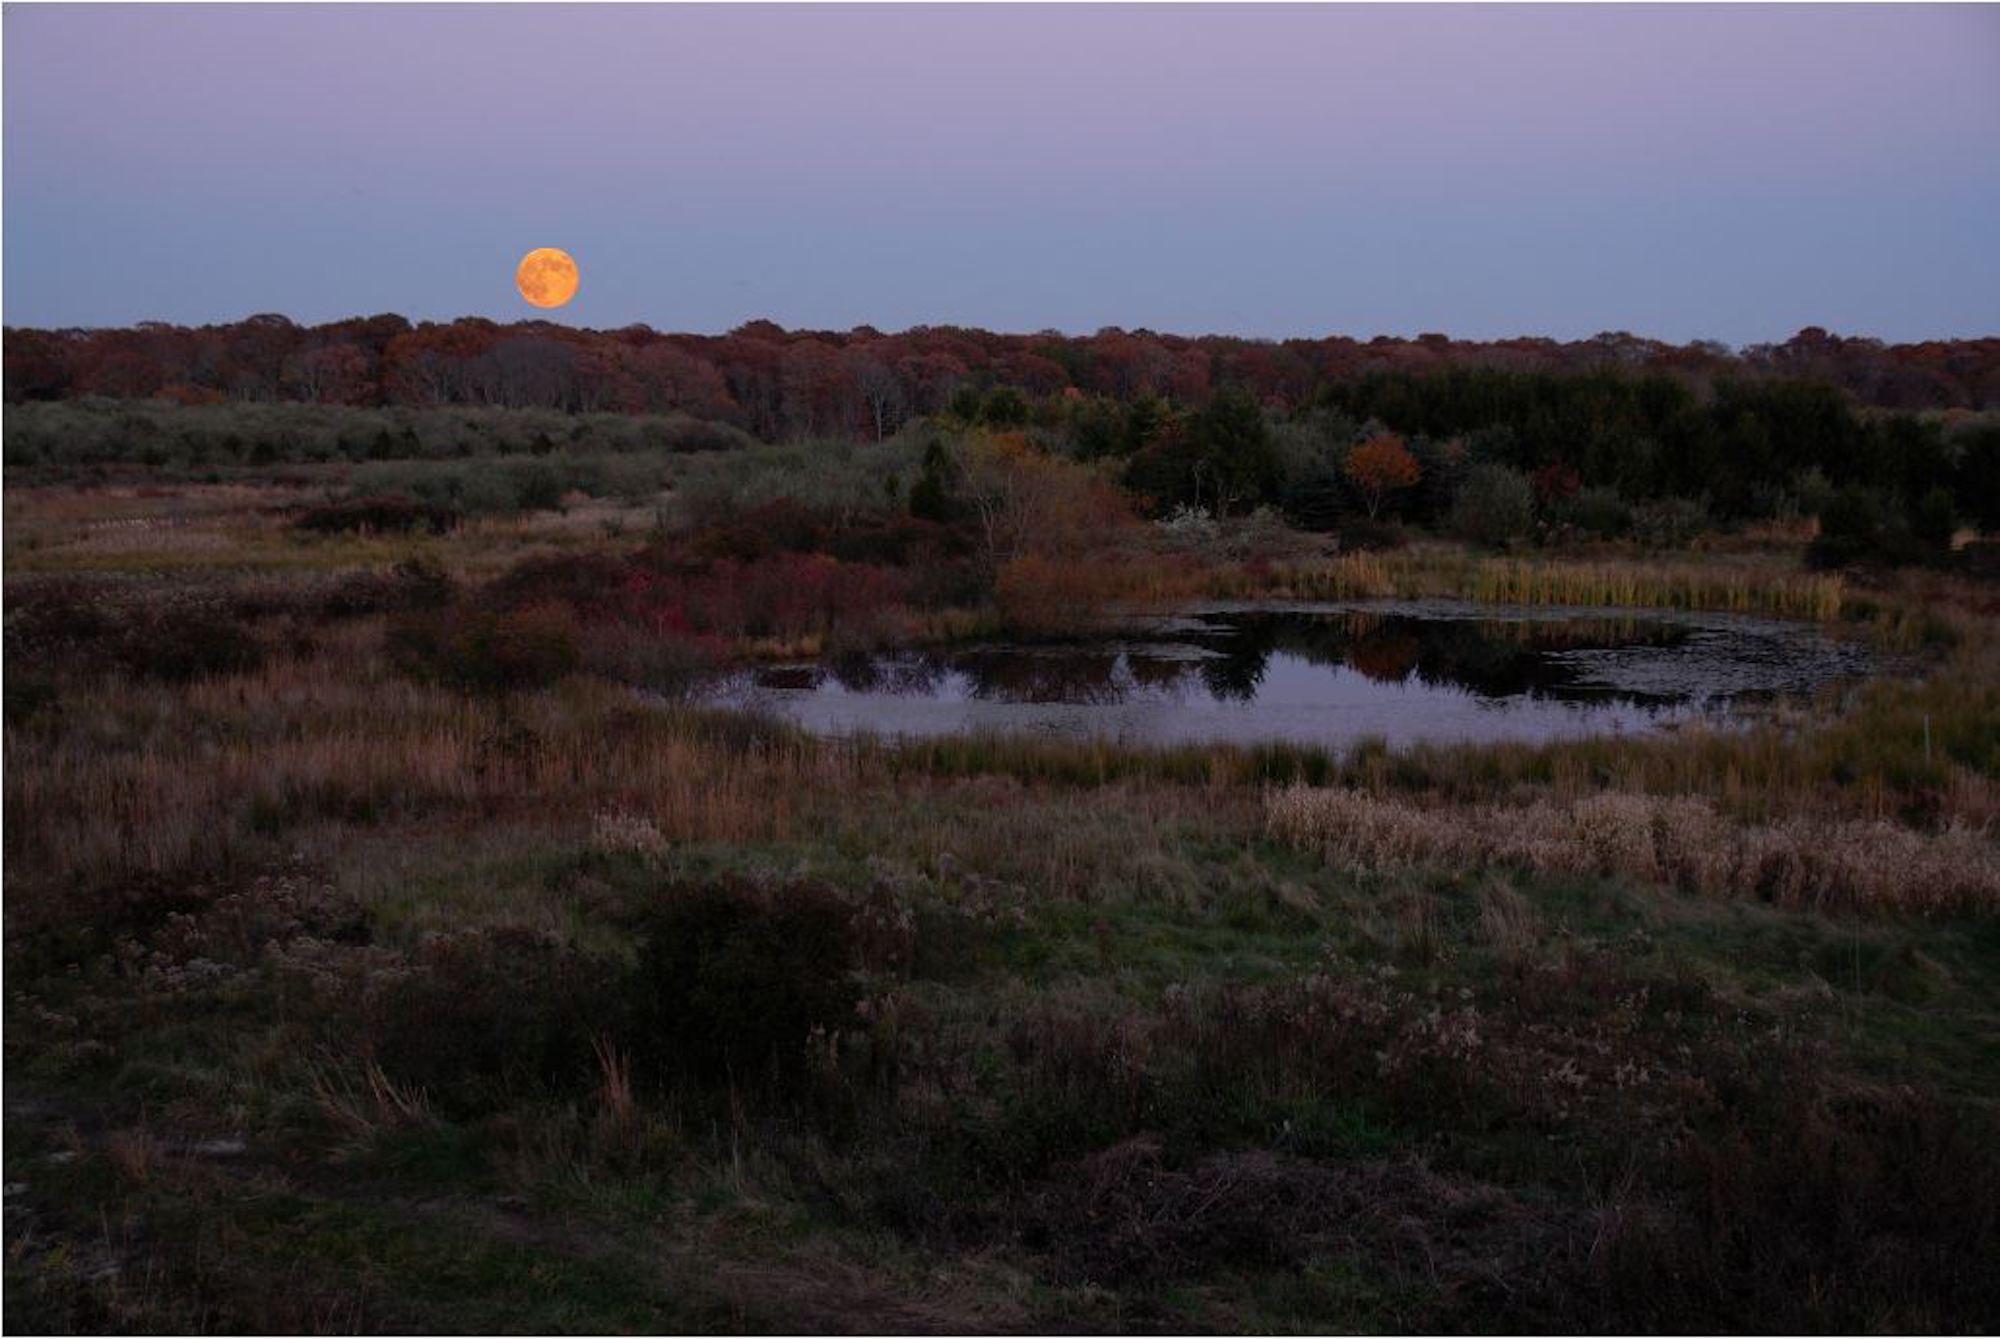 Moonrise Over Vineyard Field 11-5-06